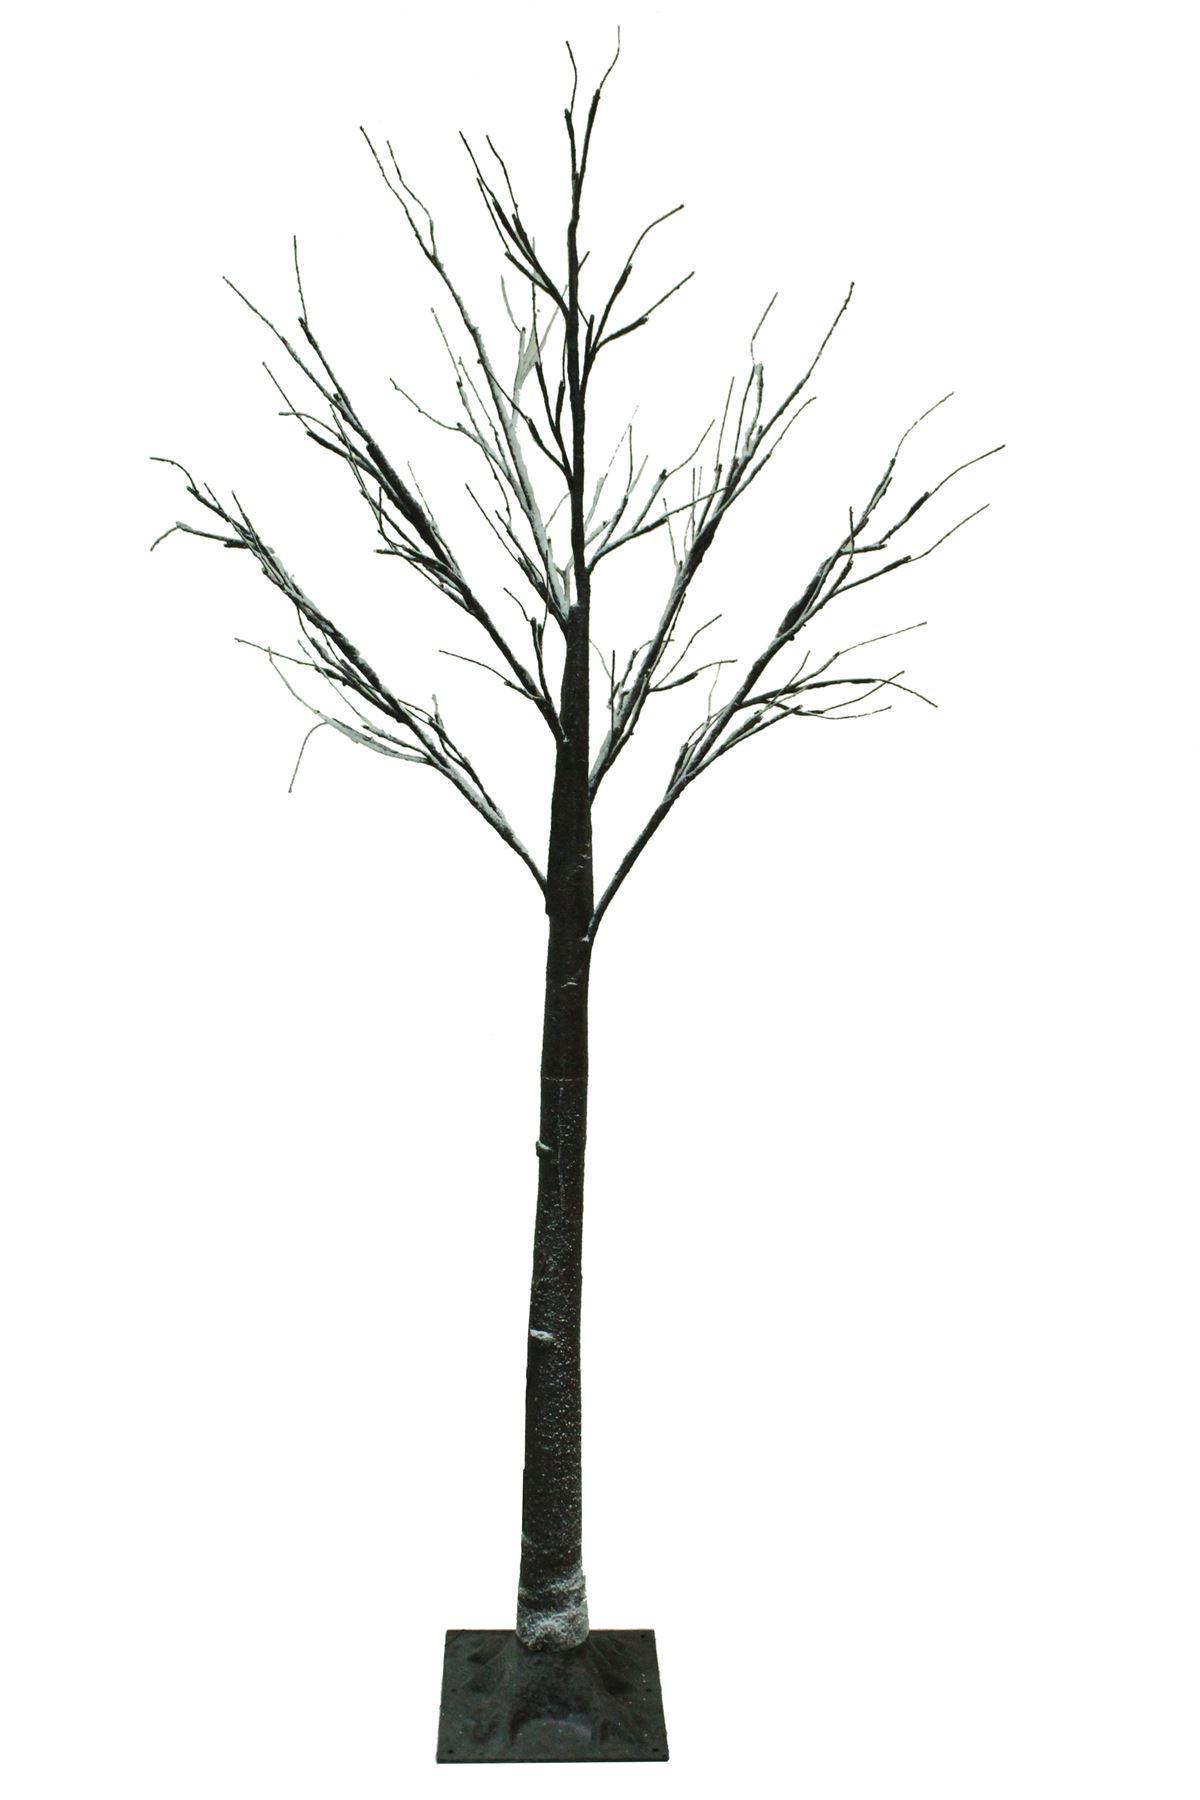 6ft Snowy Effect Warm White Twig Tree Pre Lit 120 Led Xmas